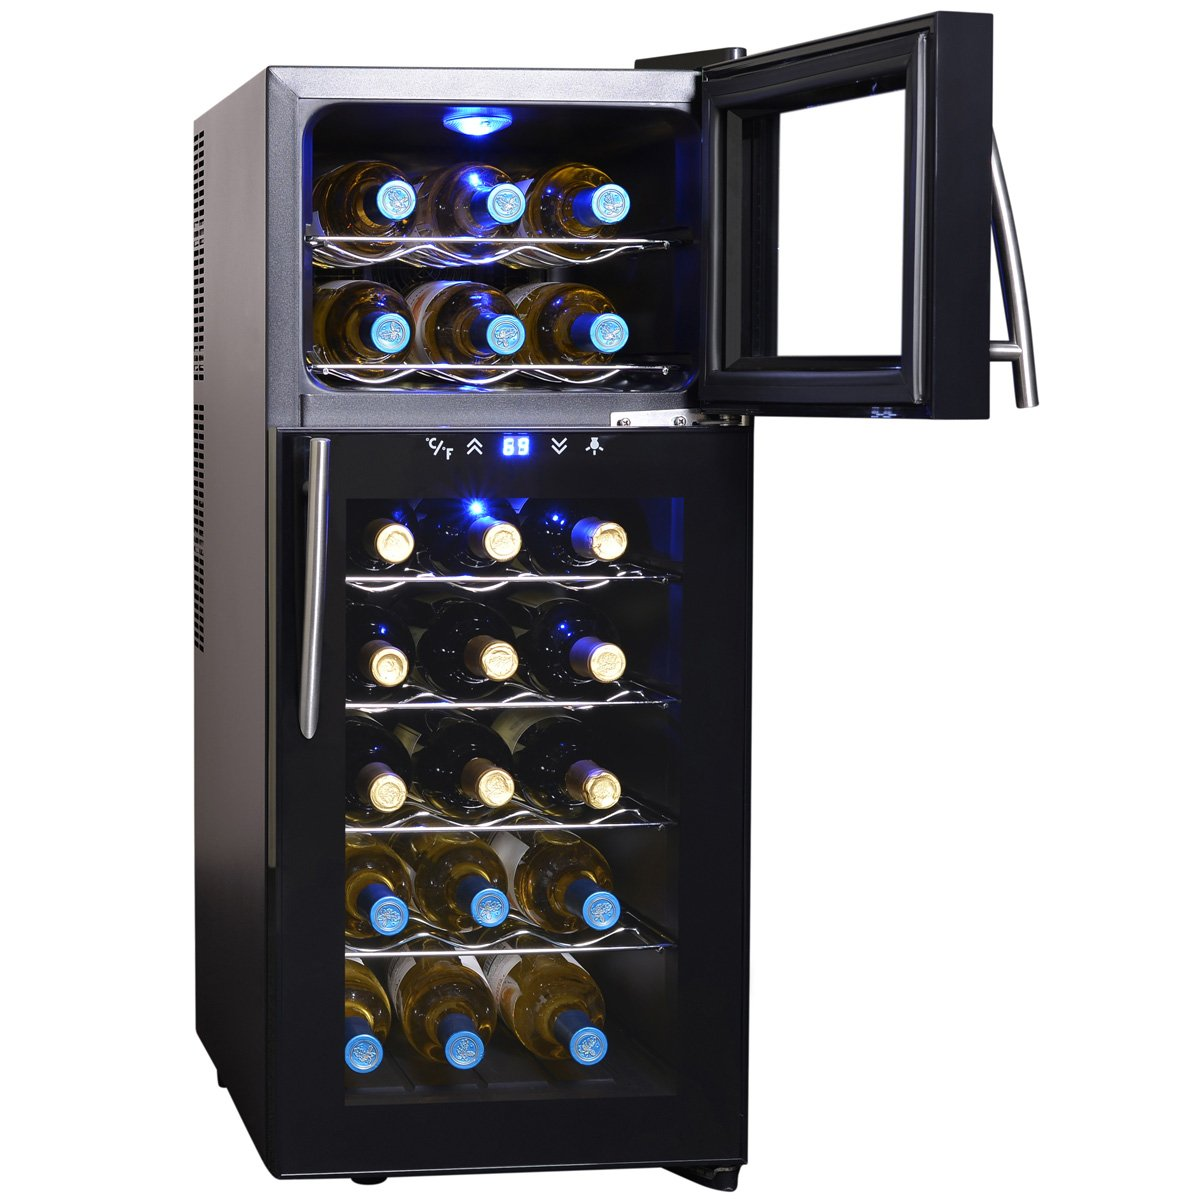 NewAir AW-210ED Wine Cooler, 21 Bottle, Black, by NewAir